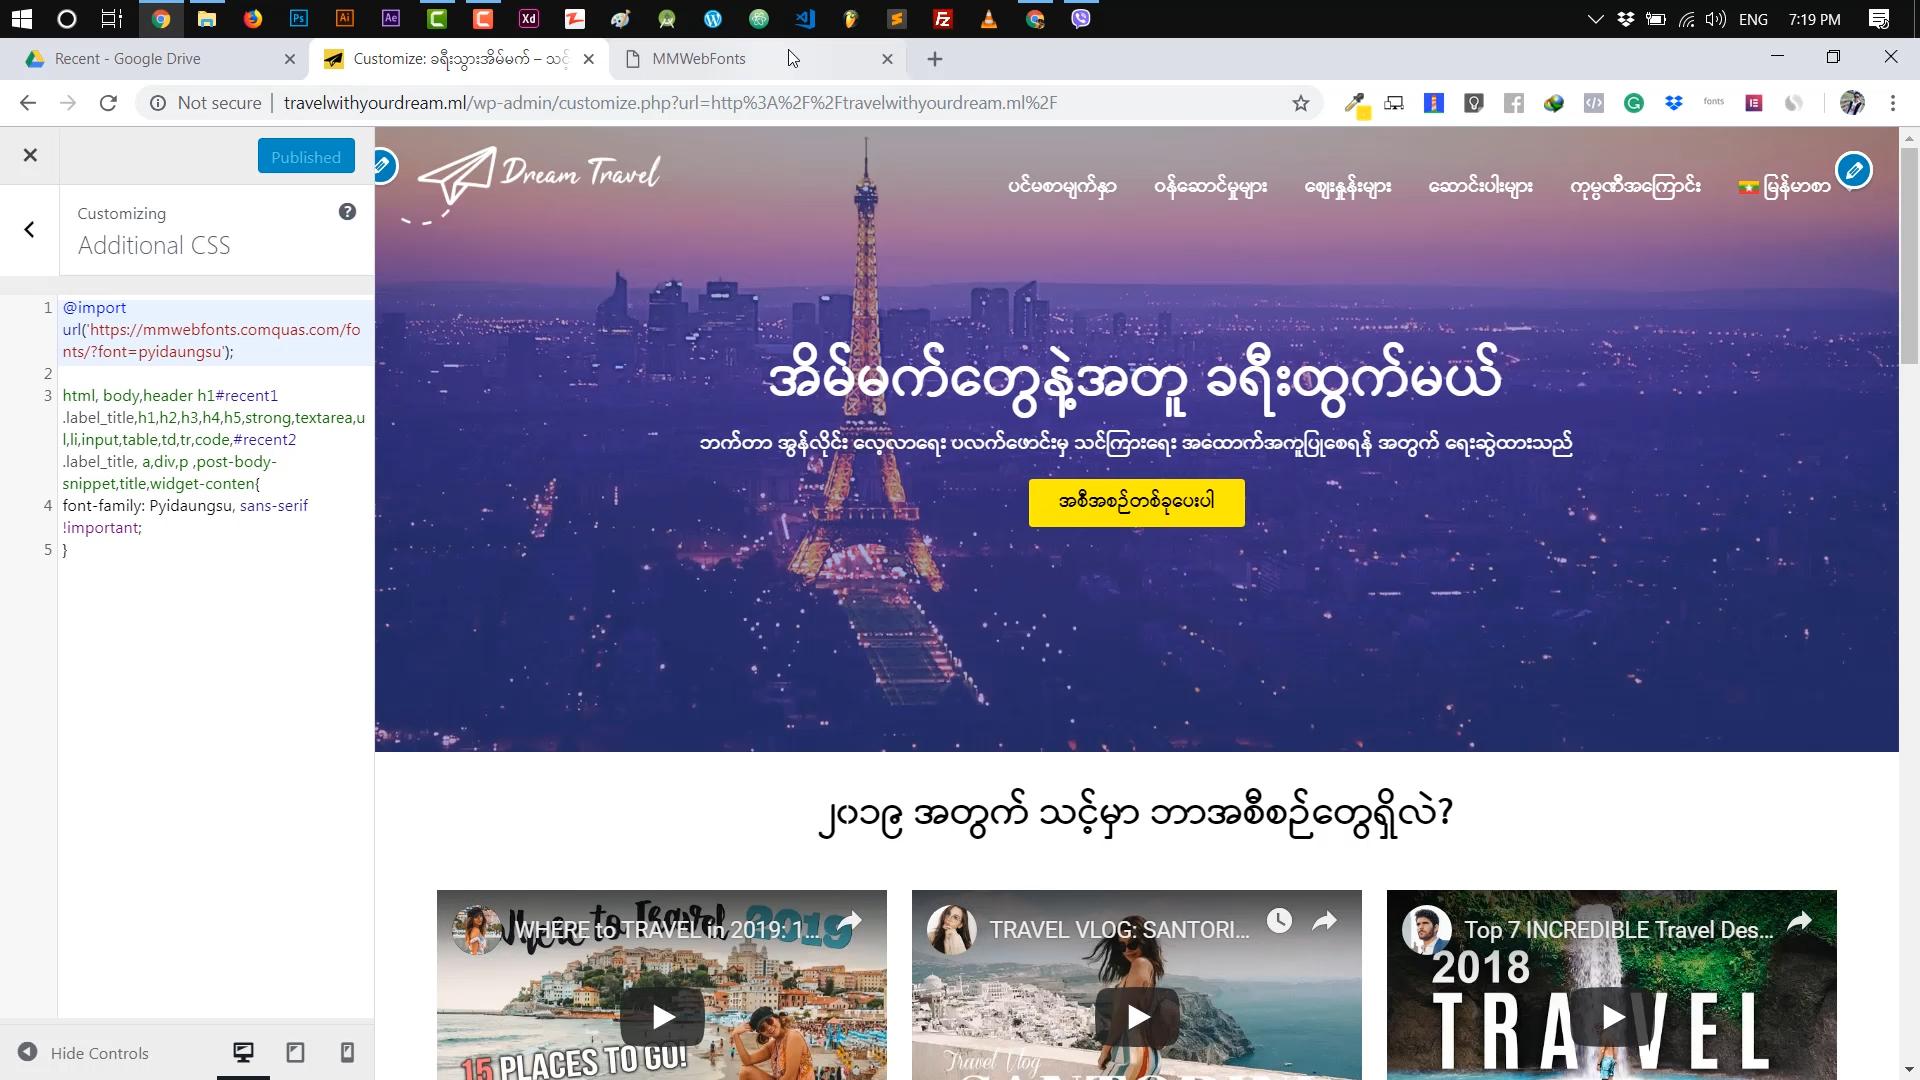 WordPress-တွင်-မြန်မာဖောင့်-အမျိုးမျိုးပြောင်းလဲသုံးစွဲခြင်း